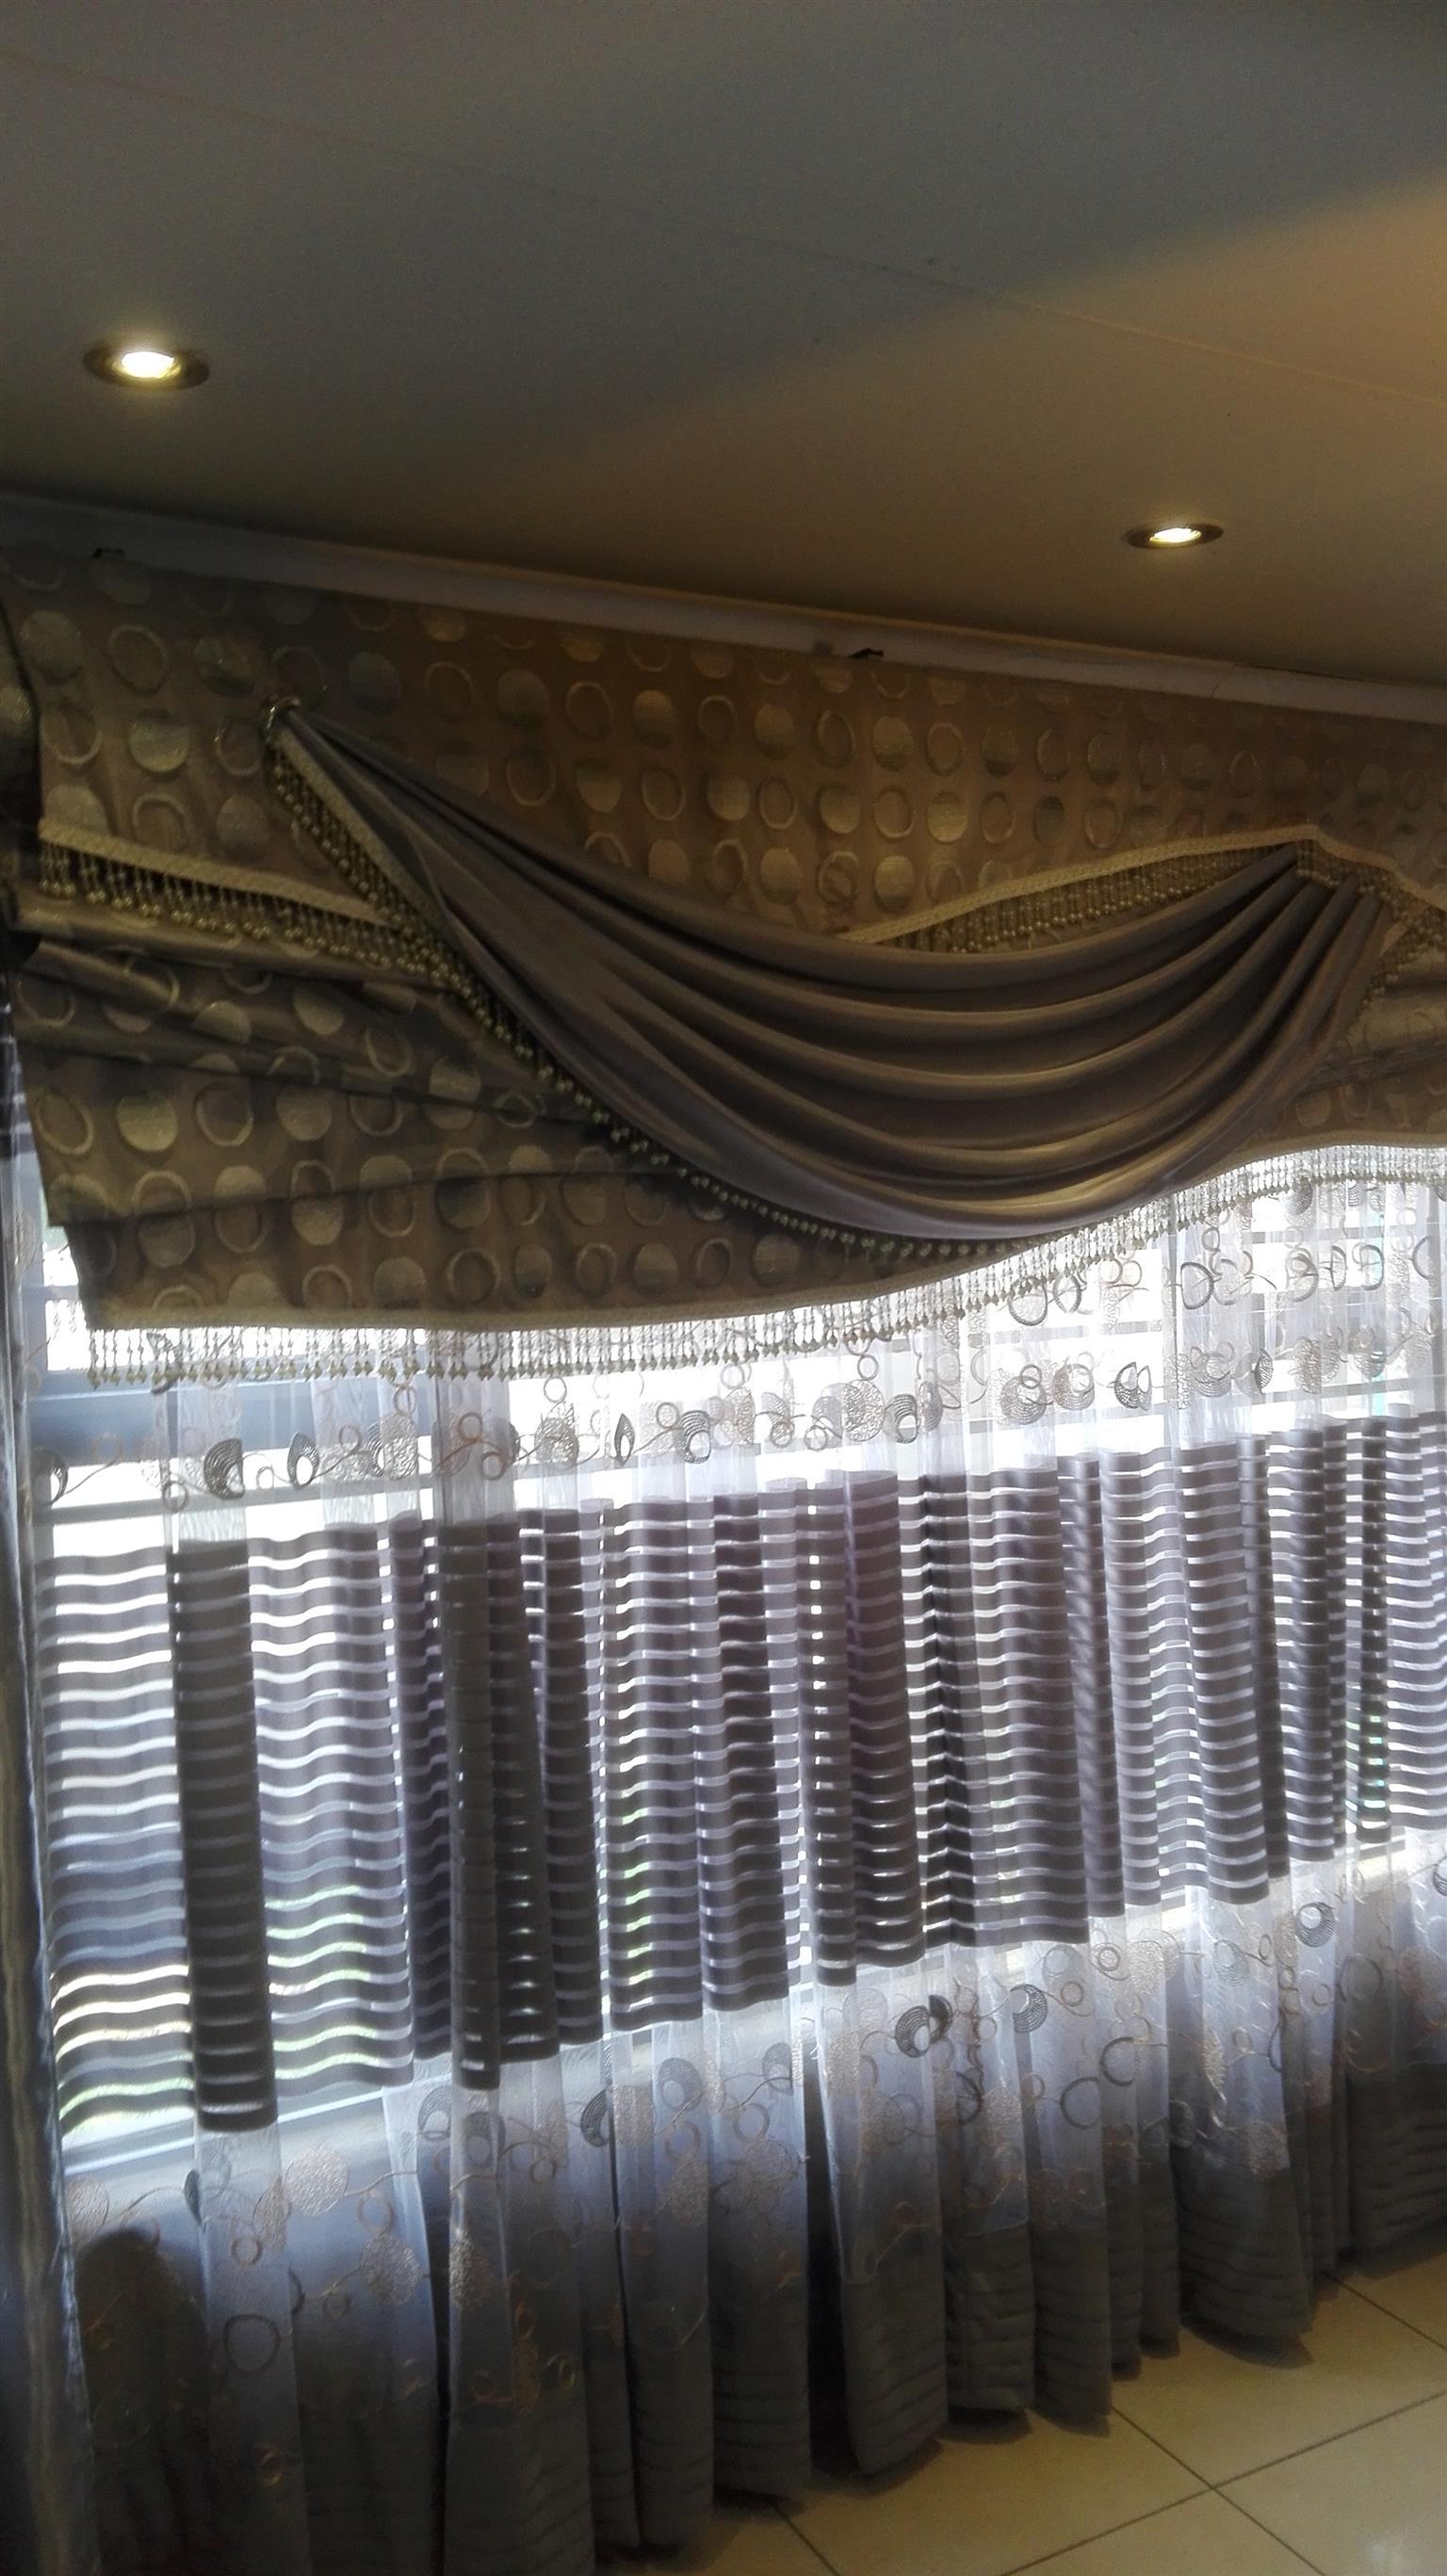 Designer Roll Up Curtains - 2 Units